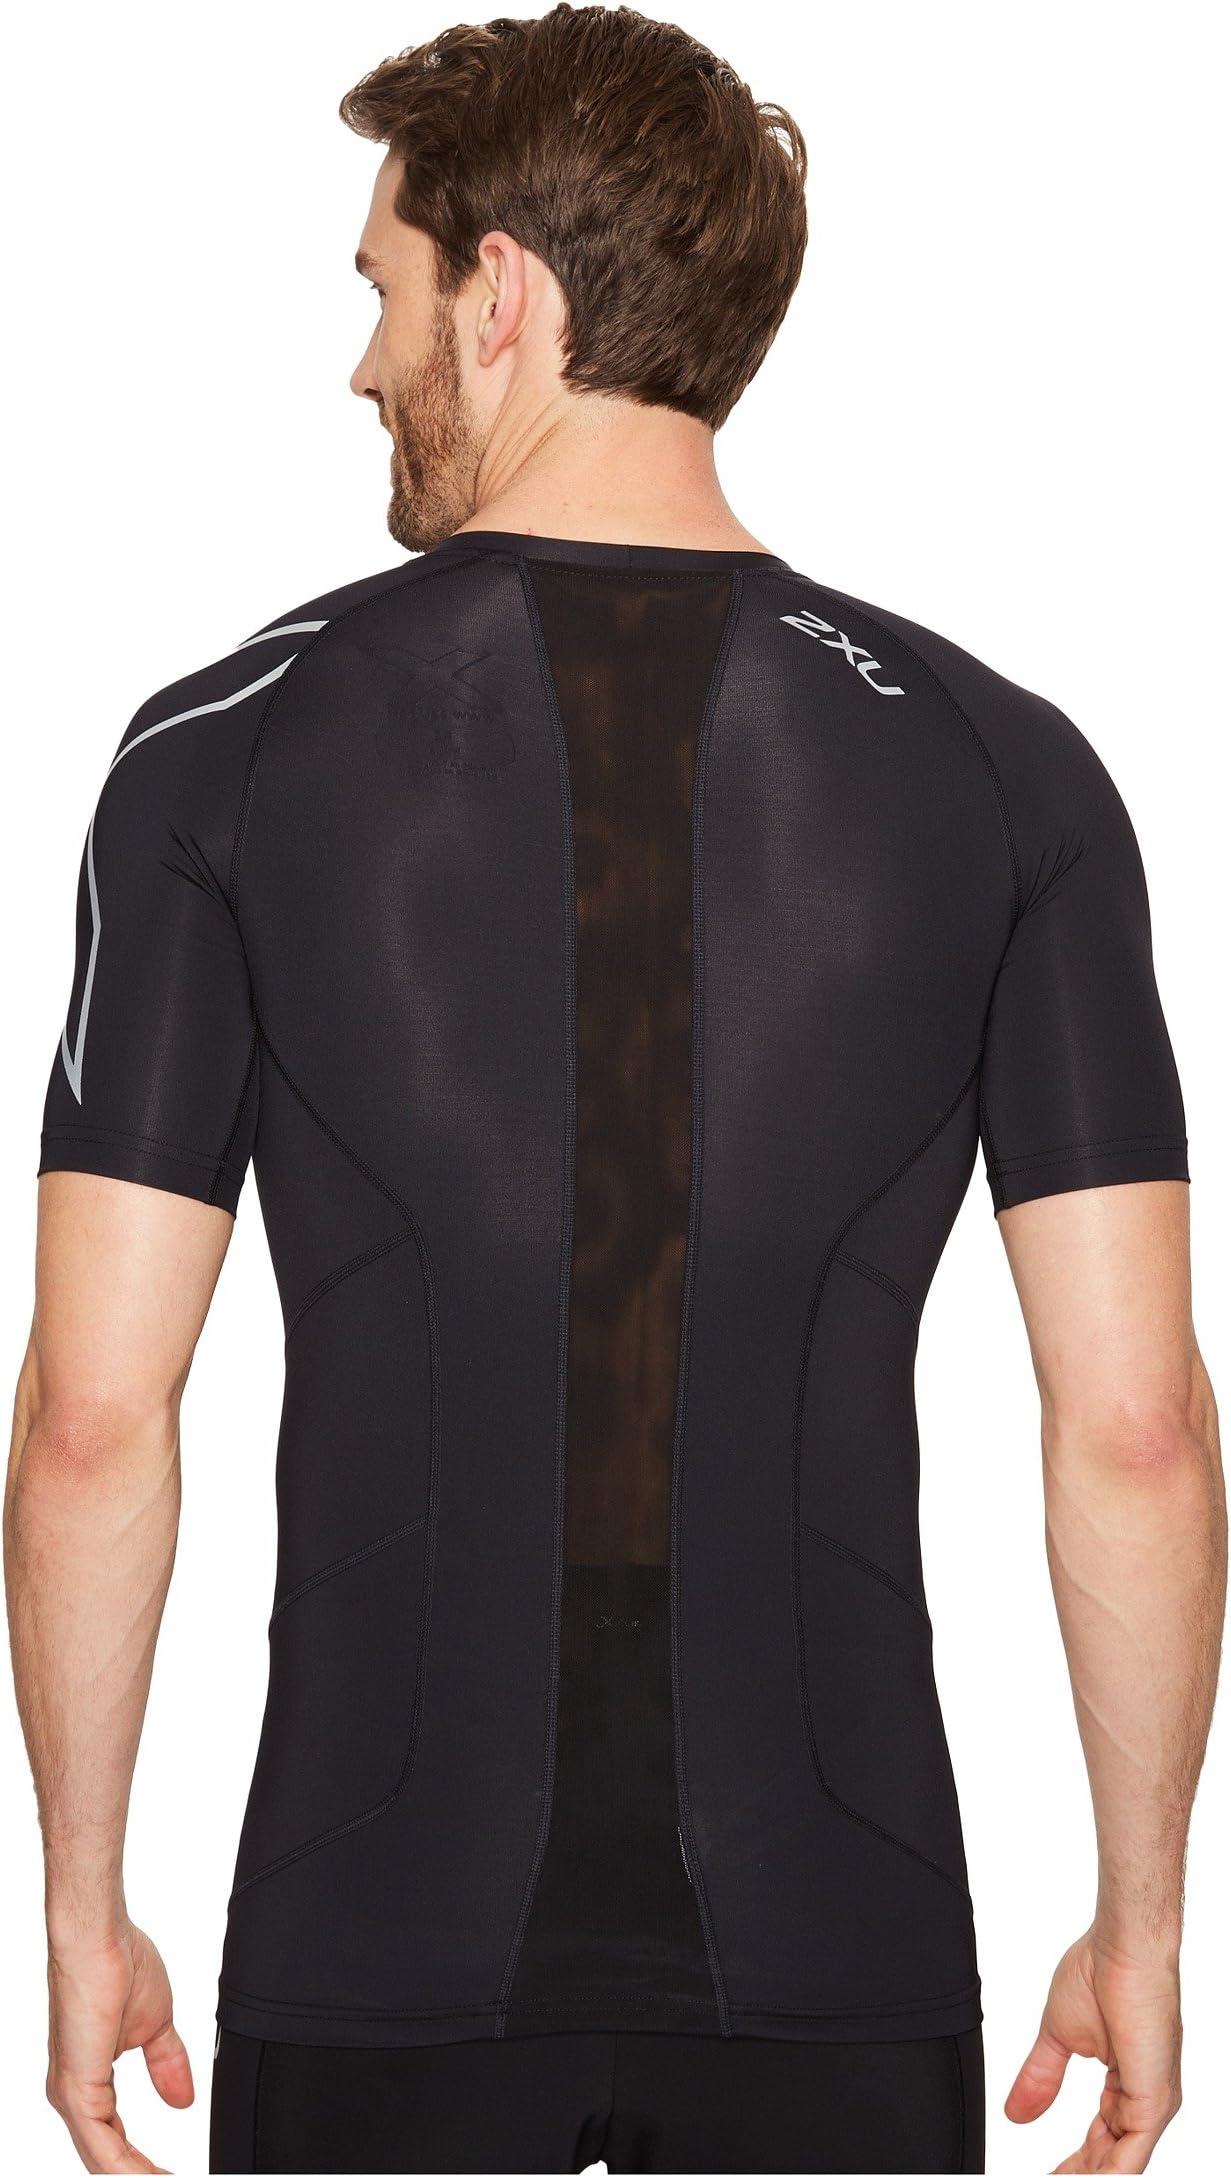 2XU Compression Short Sleeve Top Ih0Fg